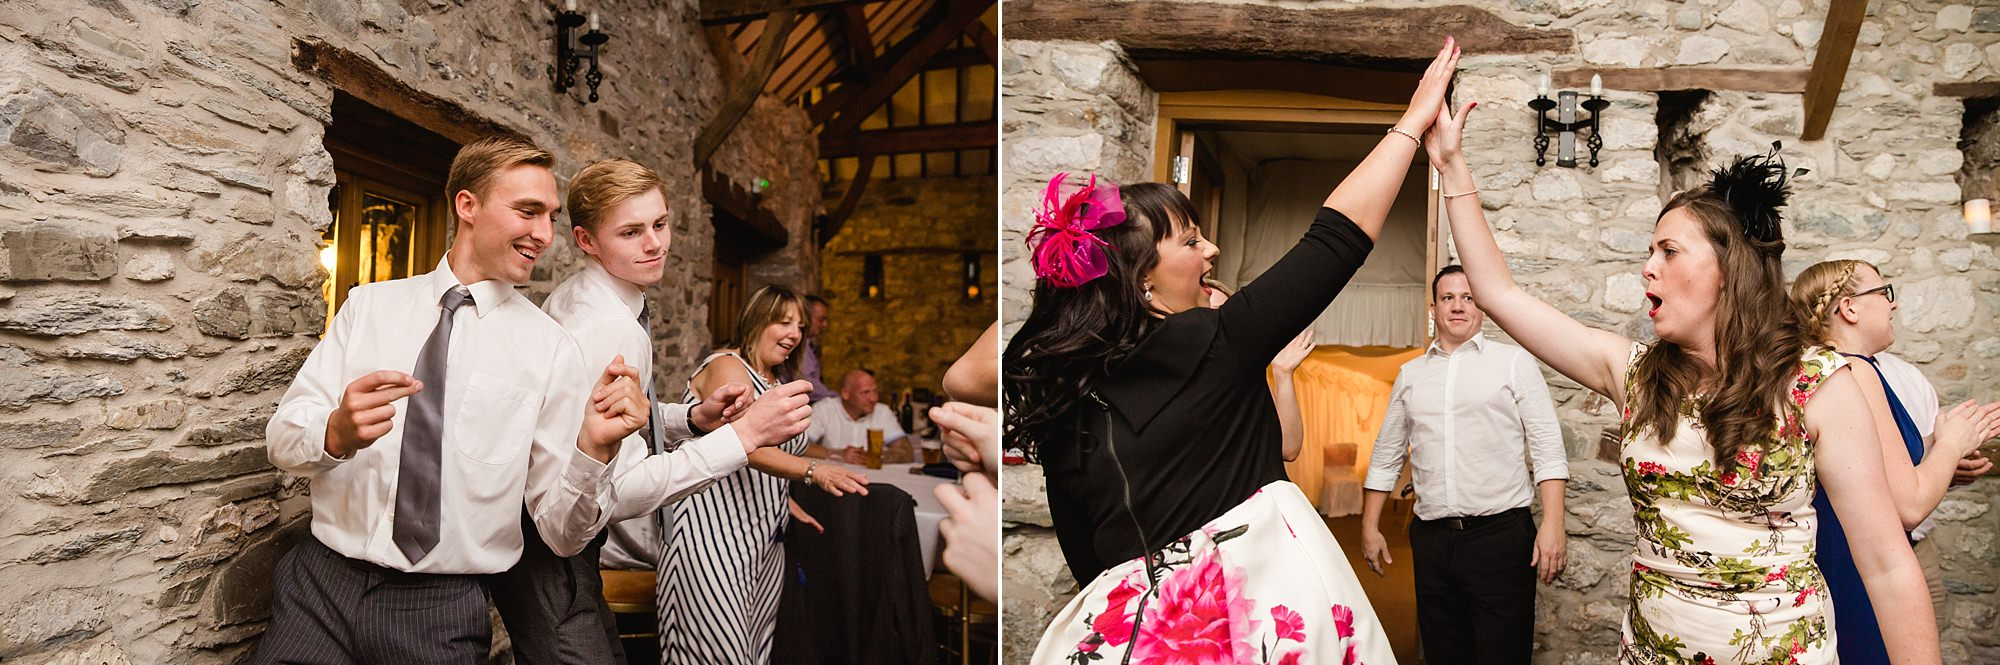 A fun wedding dance at Place Isaf wedding